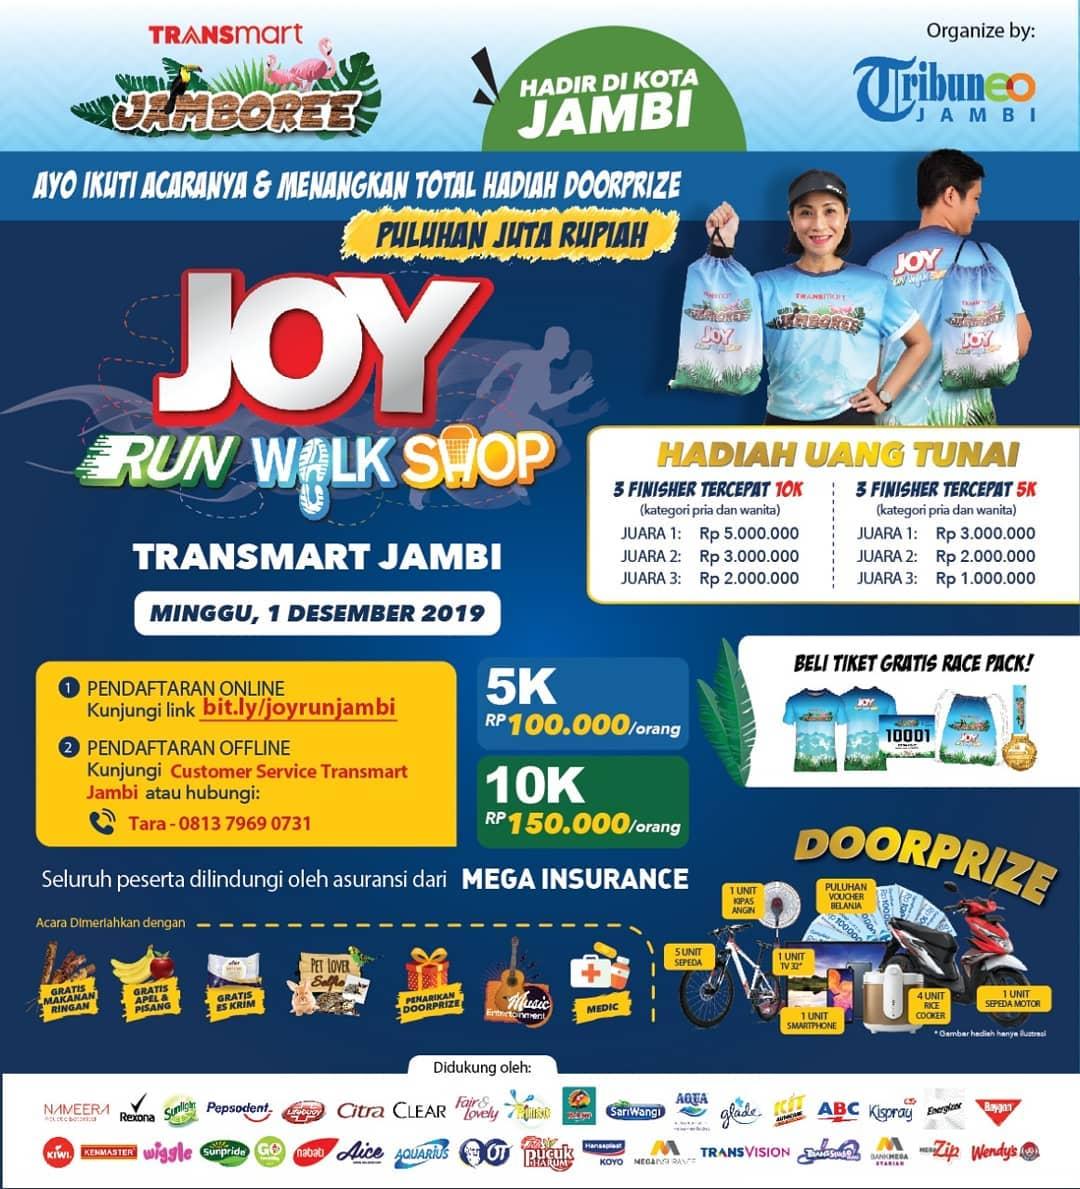 Joy: Run Walk Shop - Transmart Jambi • 2019